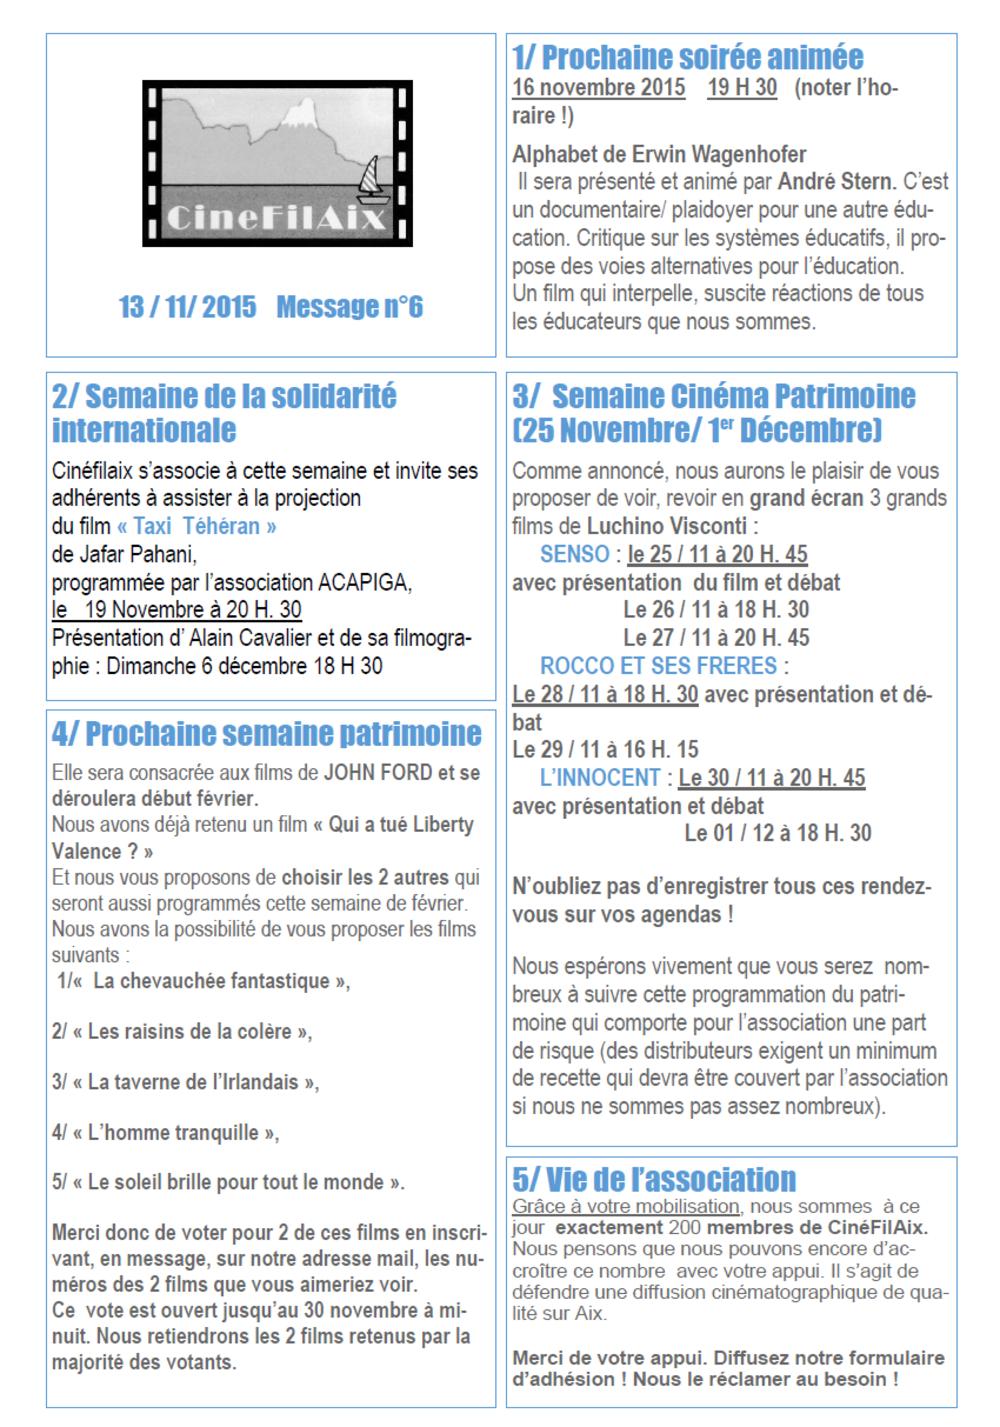 message N ° 6 CinéFilAix